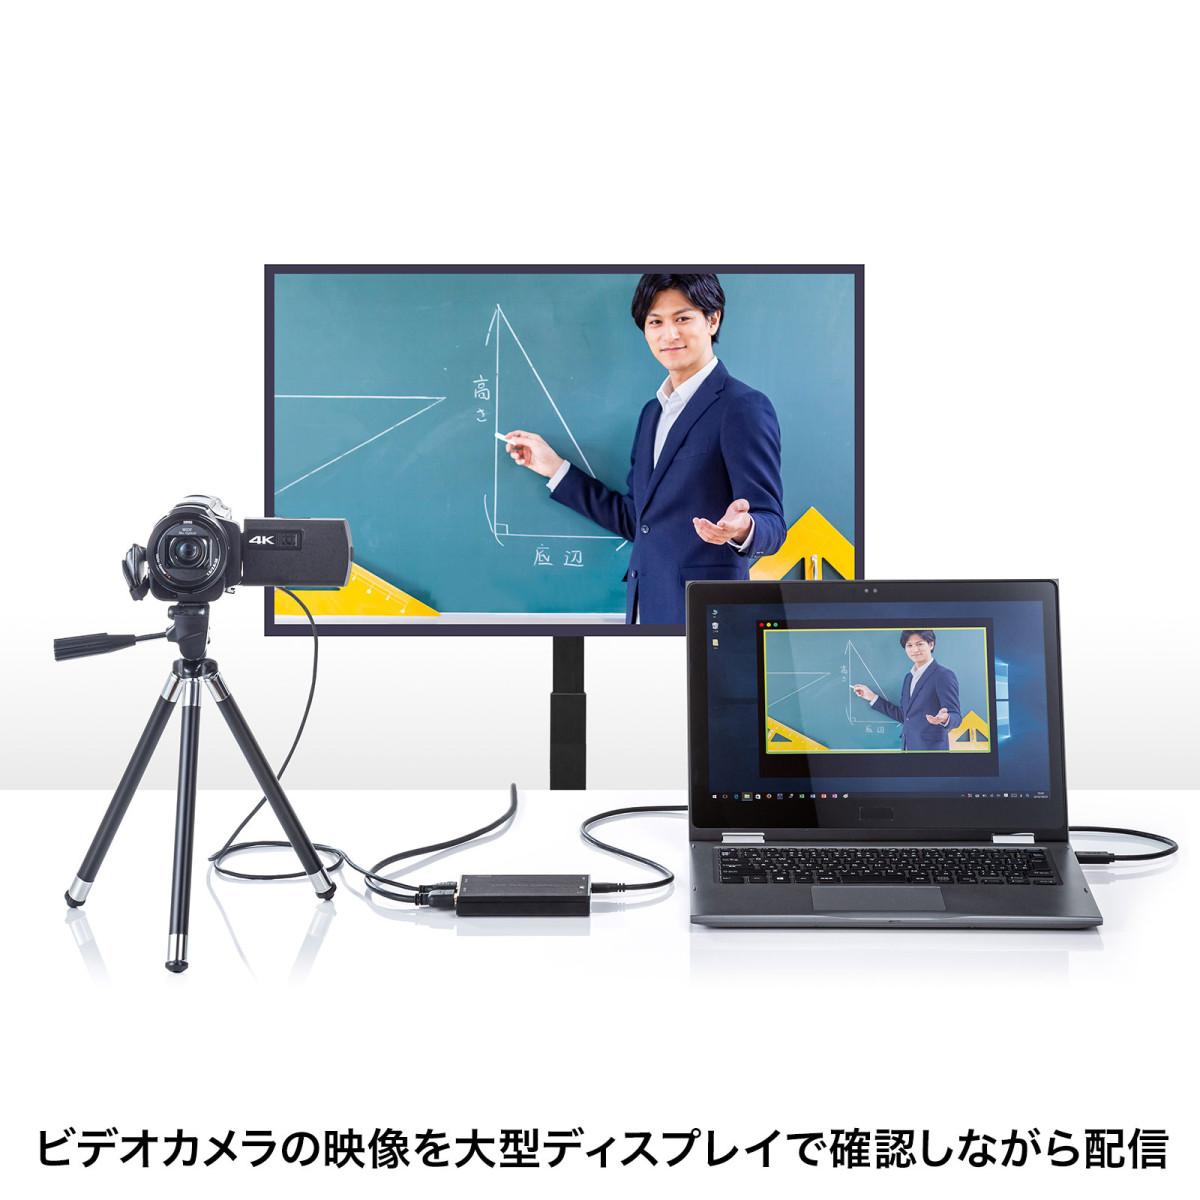 [USB-CVHDUVC3] HDMIキャプチャー(USB3.2 Gen1・4K パススルー出力付き)